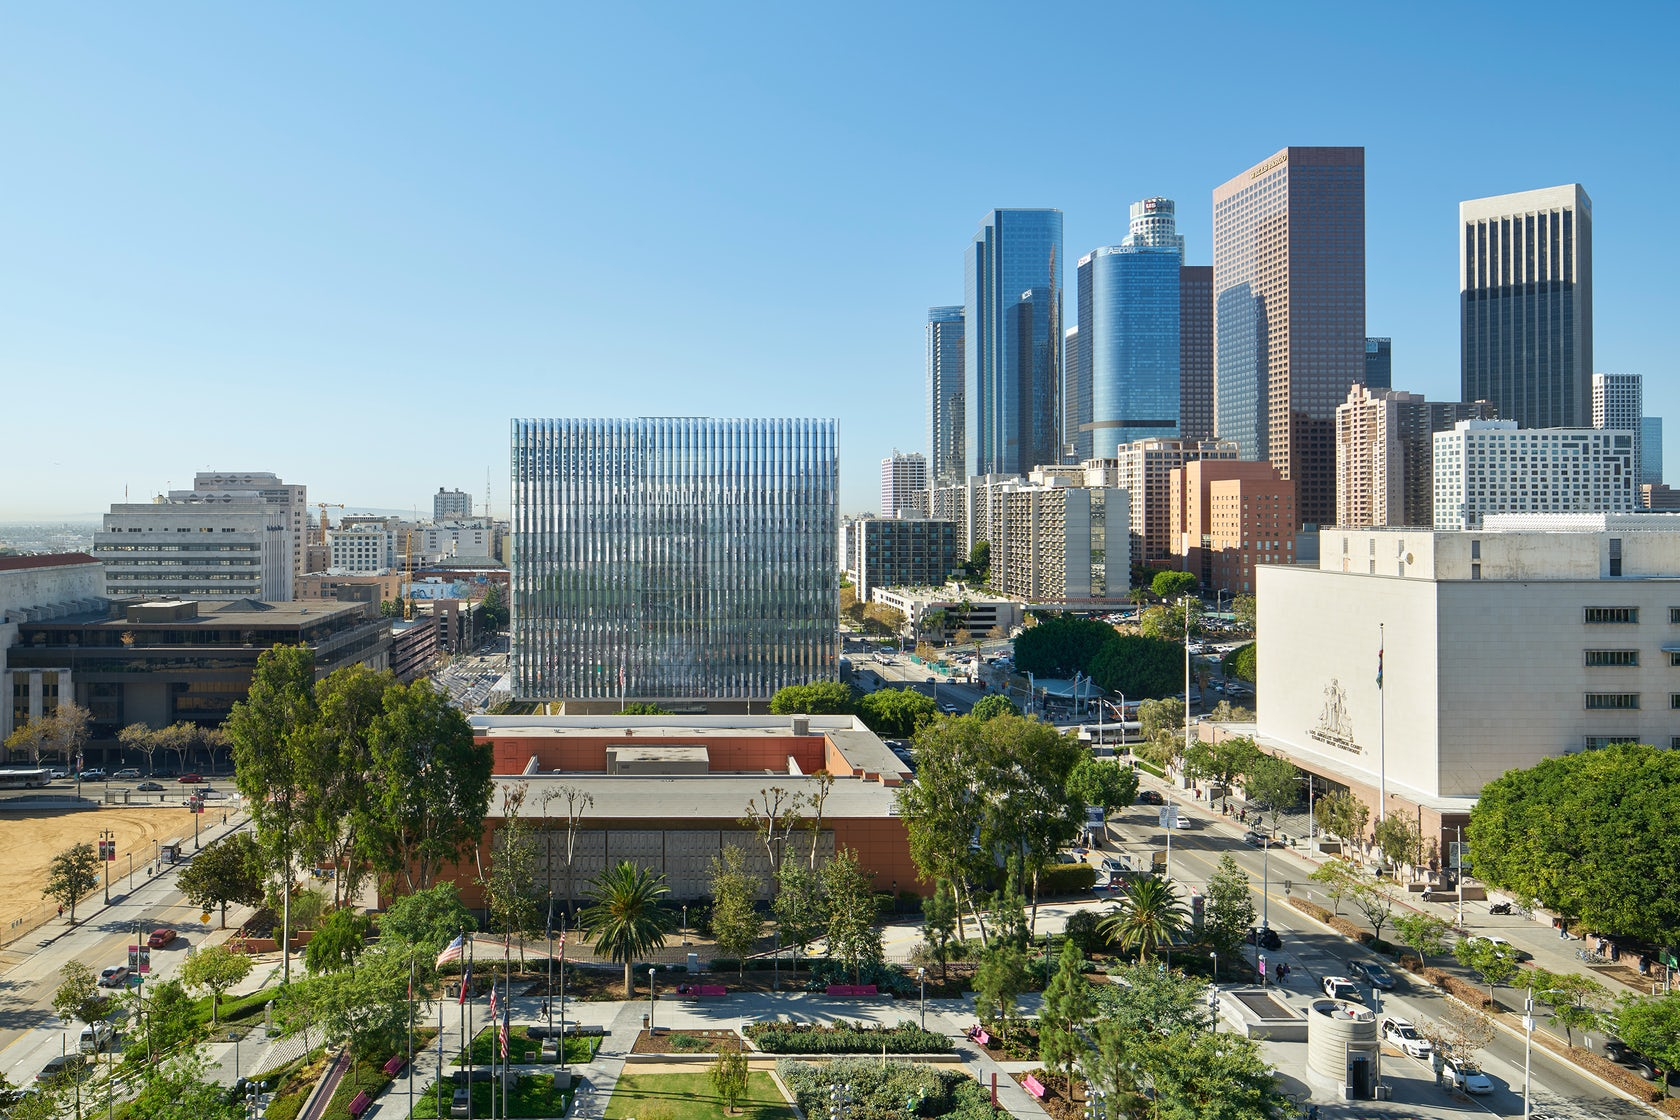 YoungGayManVirility - Los Angeles, California, United